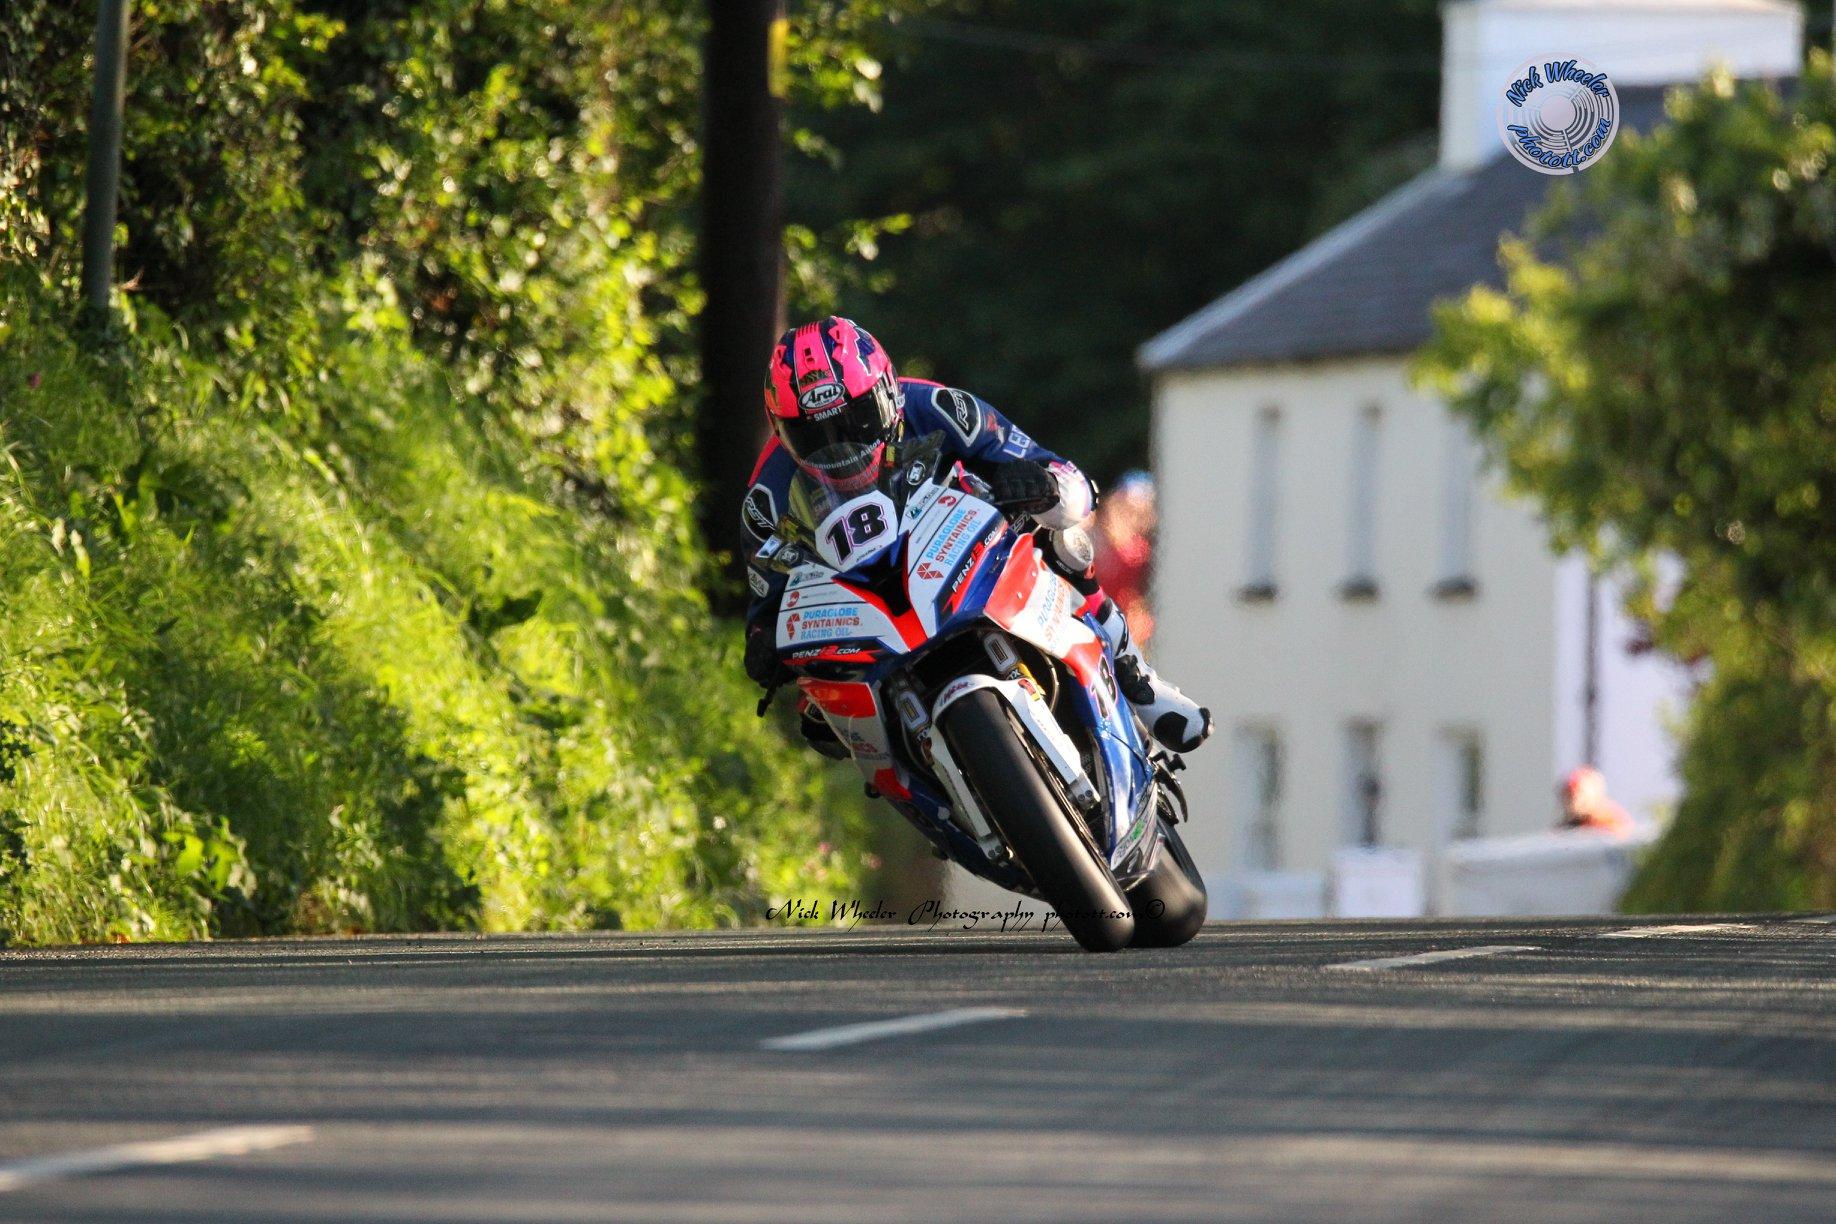 IRRC Superbike Title Winner Todd Crowned BMW Motorrad Race Trophy Champion